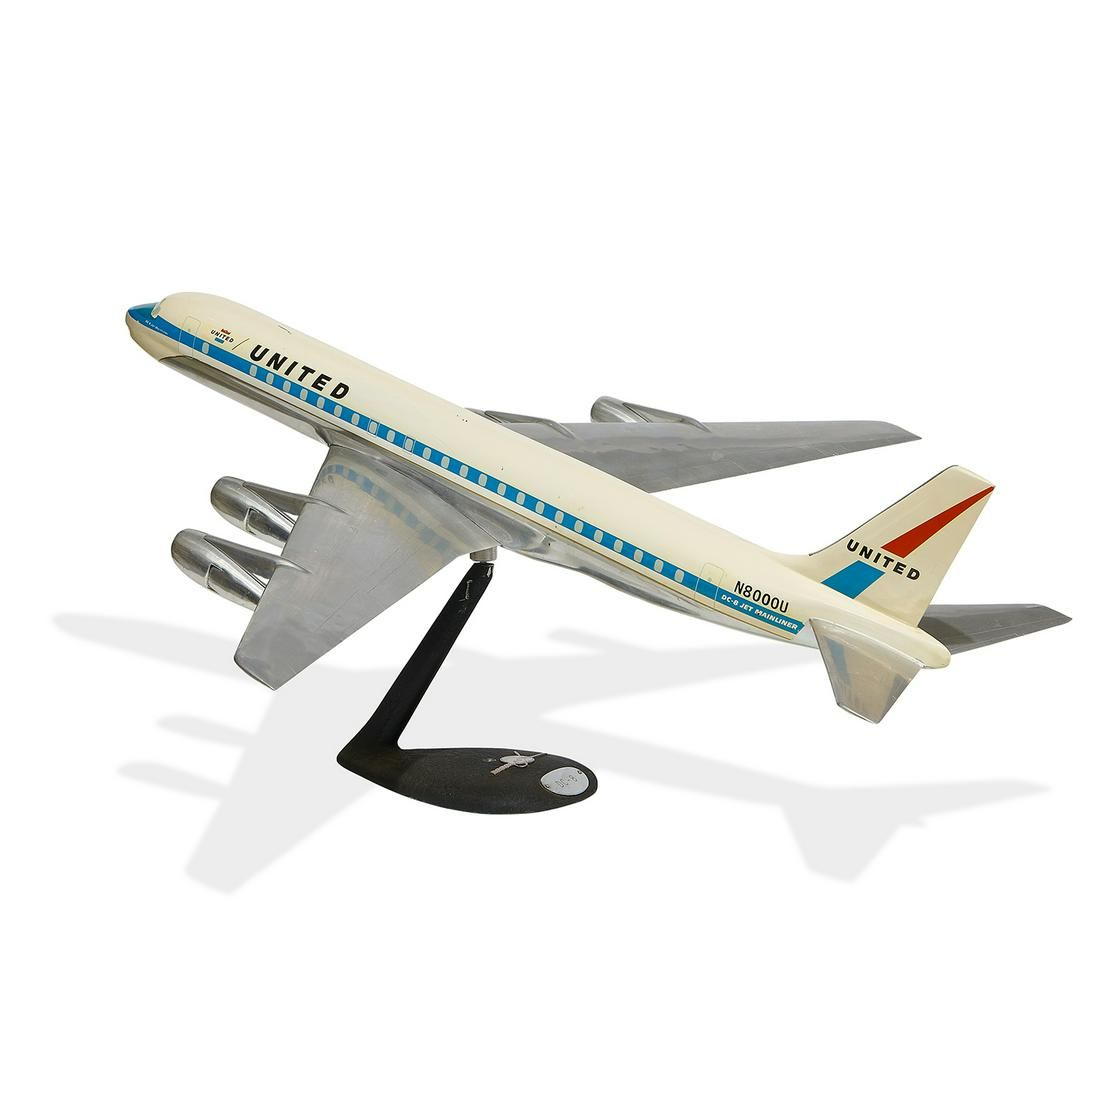 Westway Aircraft Models DC-8 model airplane